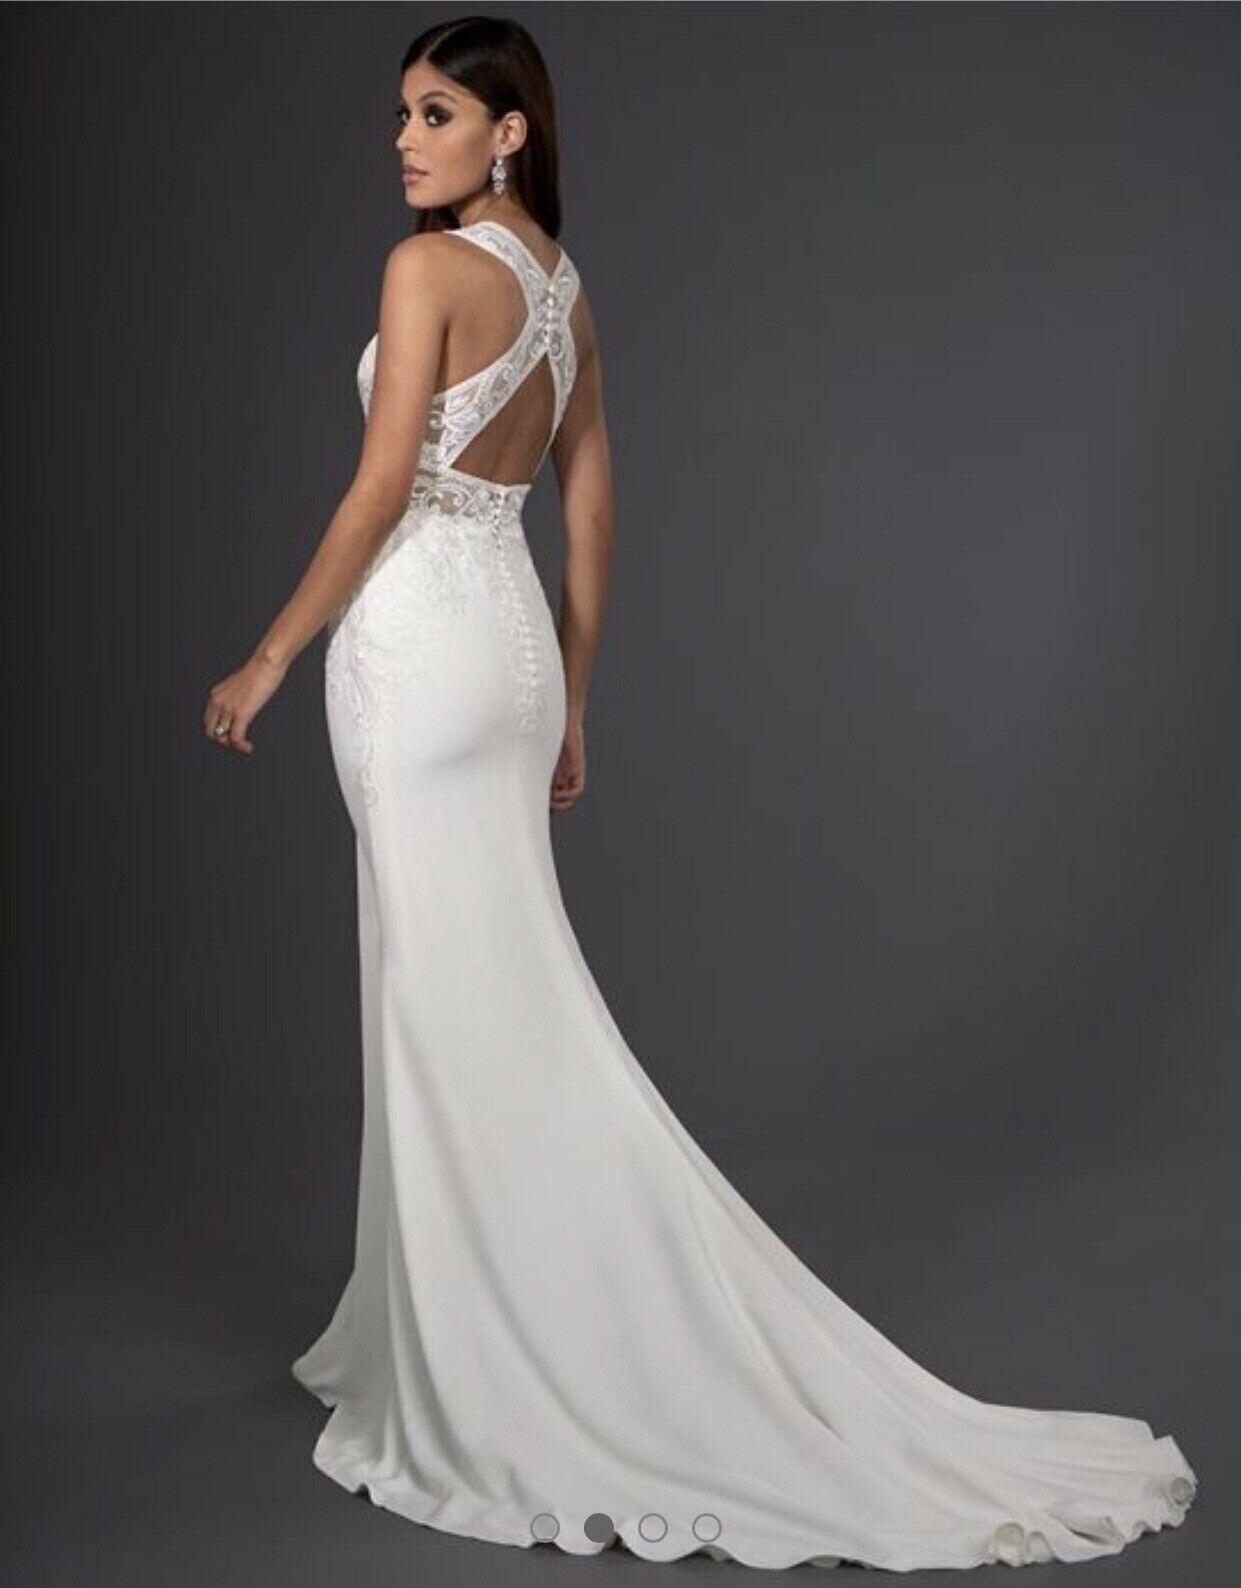 NEW Signature Collection Logan Wedding Dress Size 10